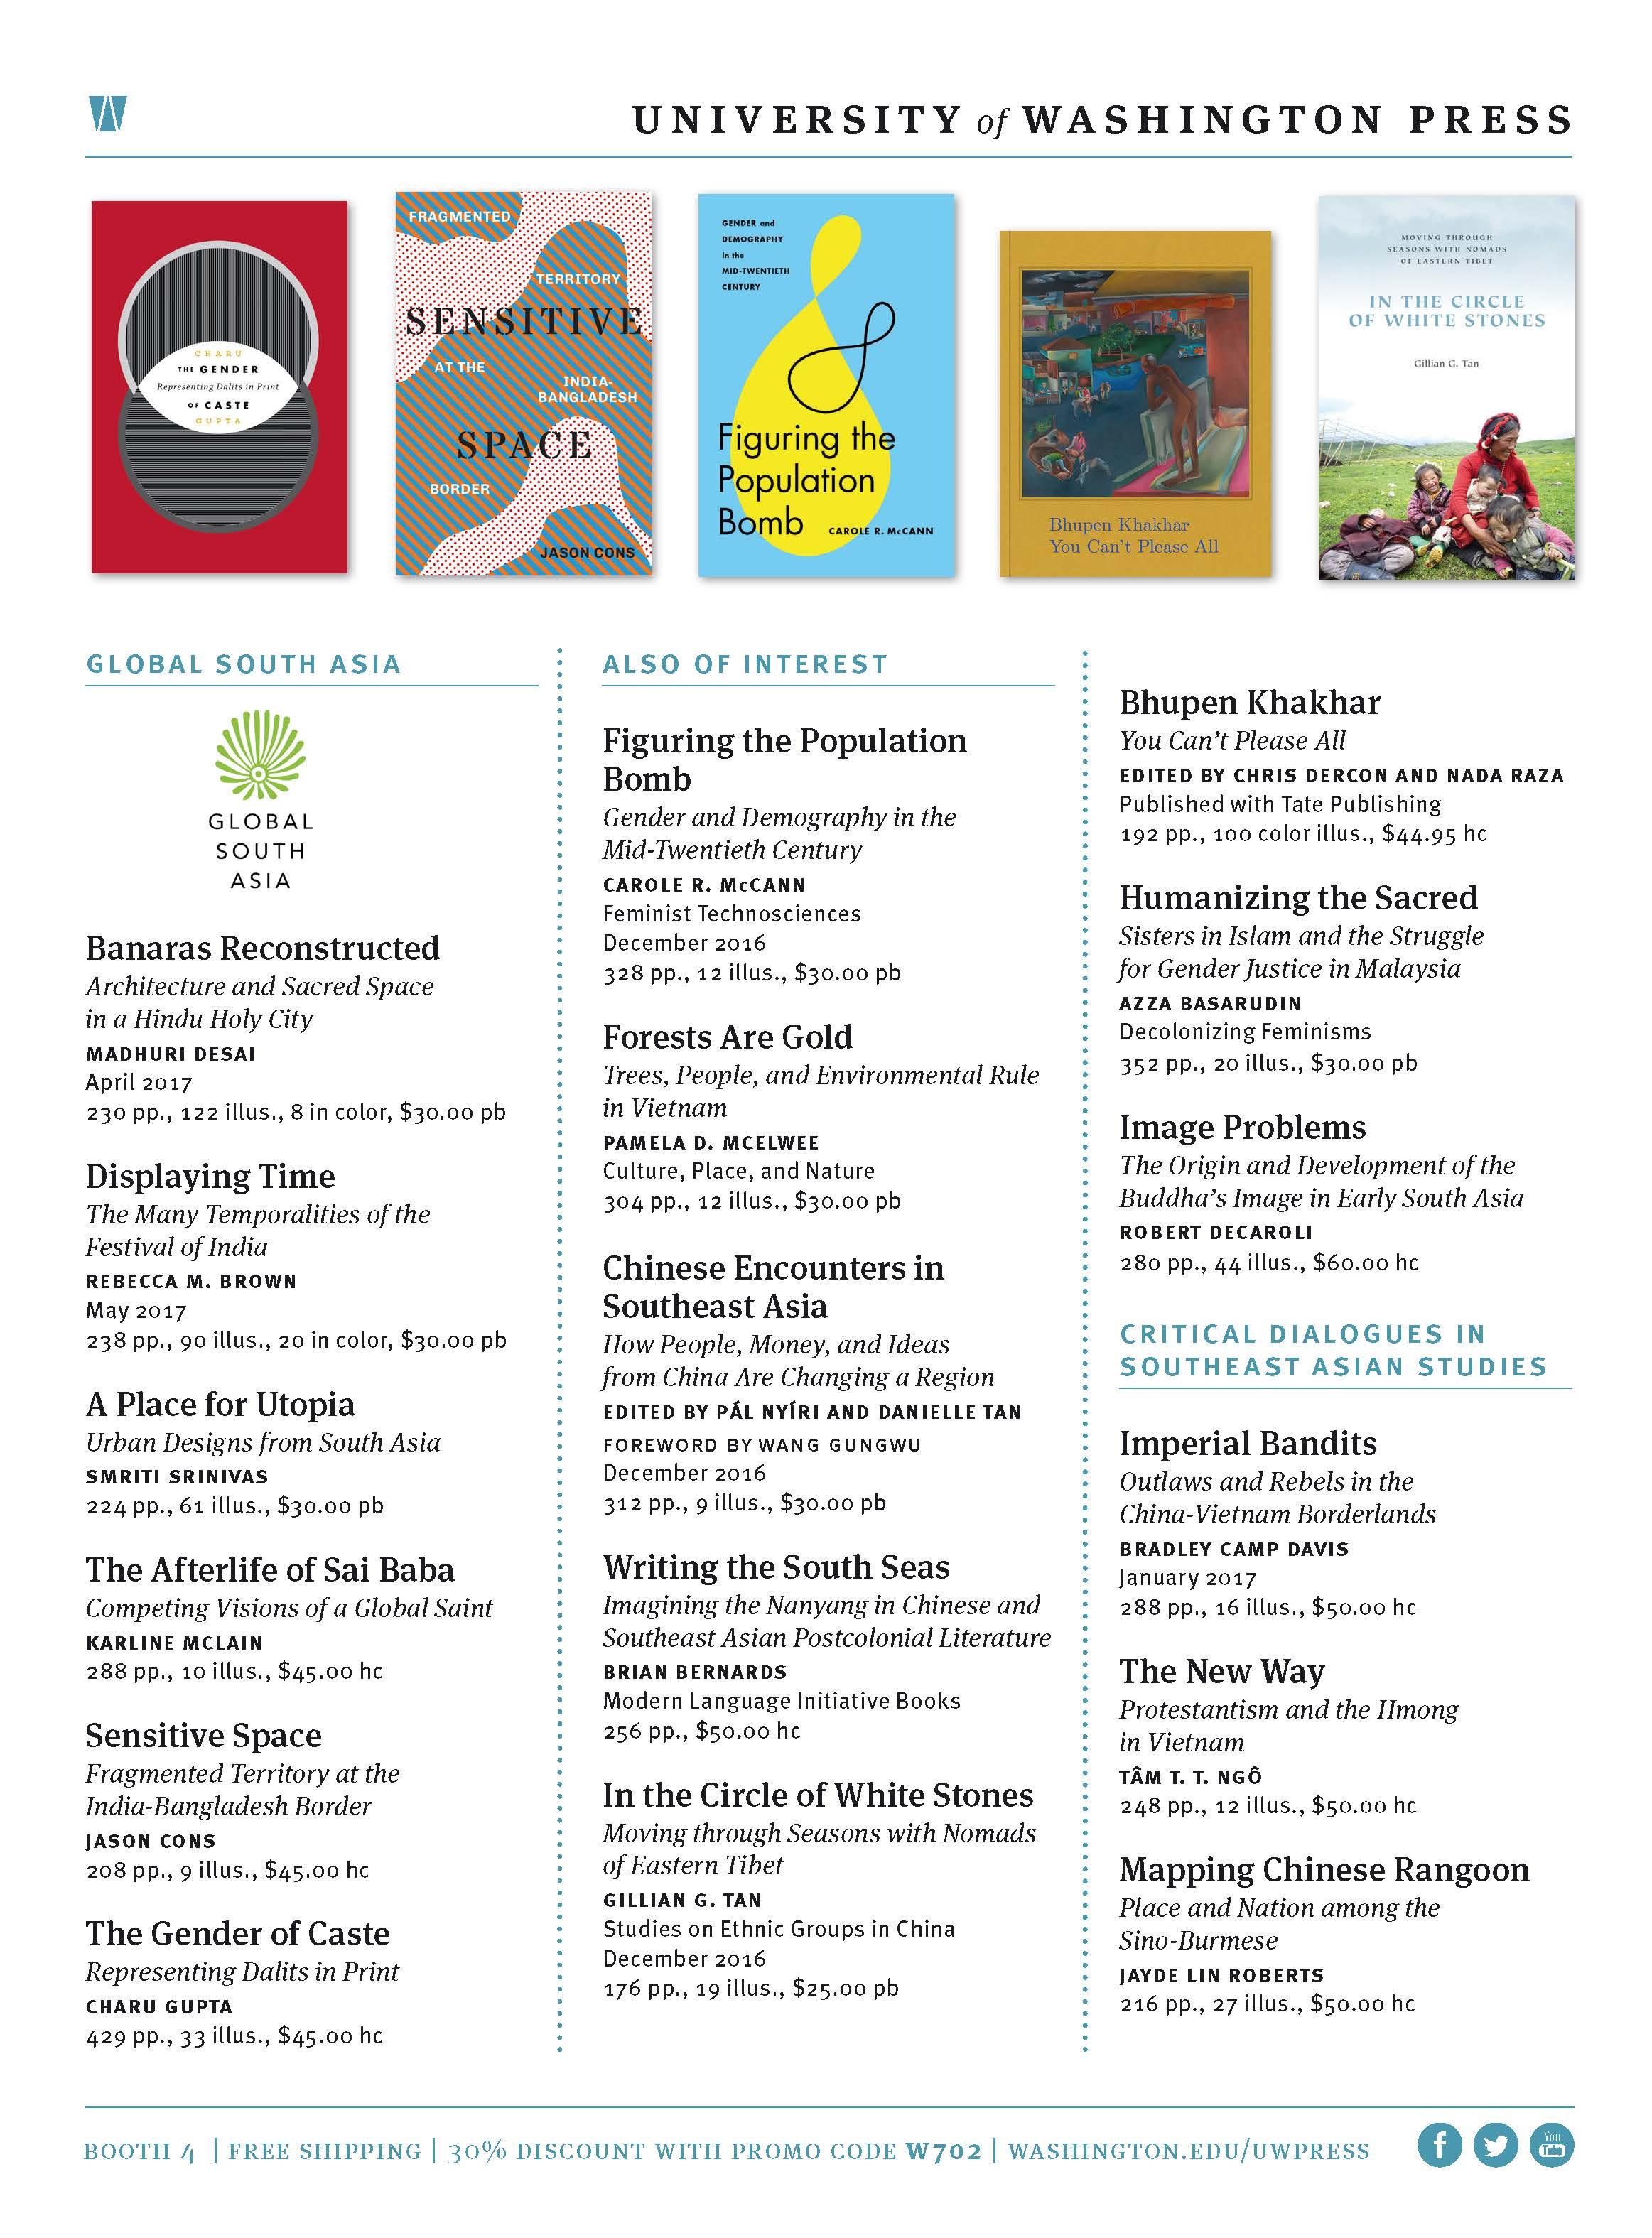 Global South Asia | University of Washington Press Blog